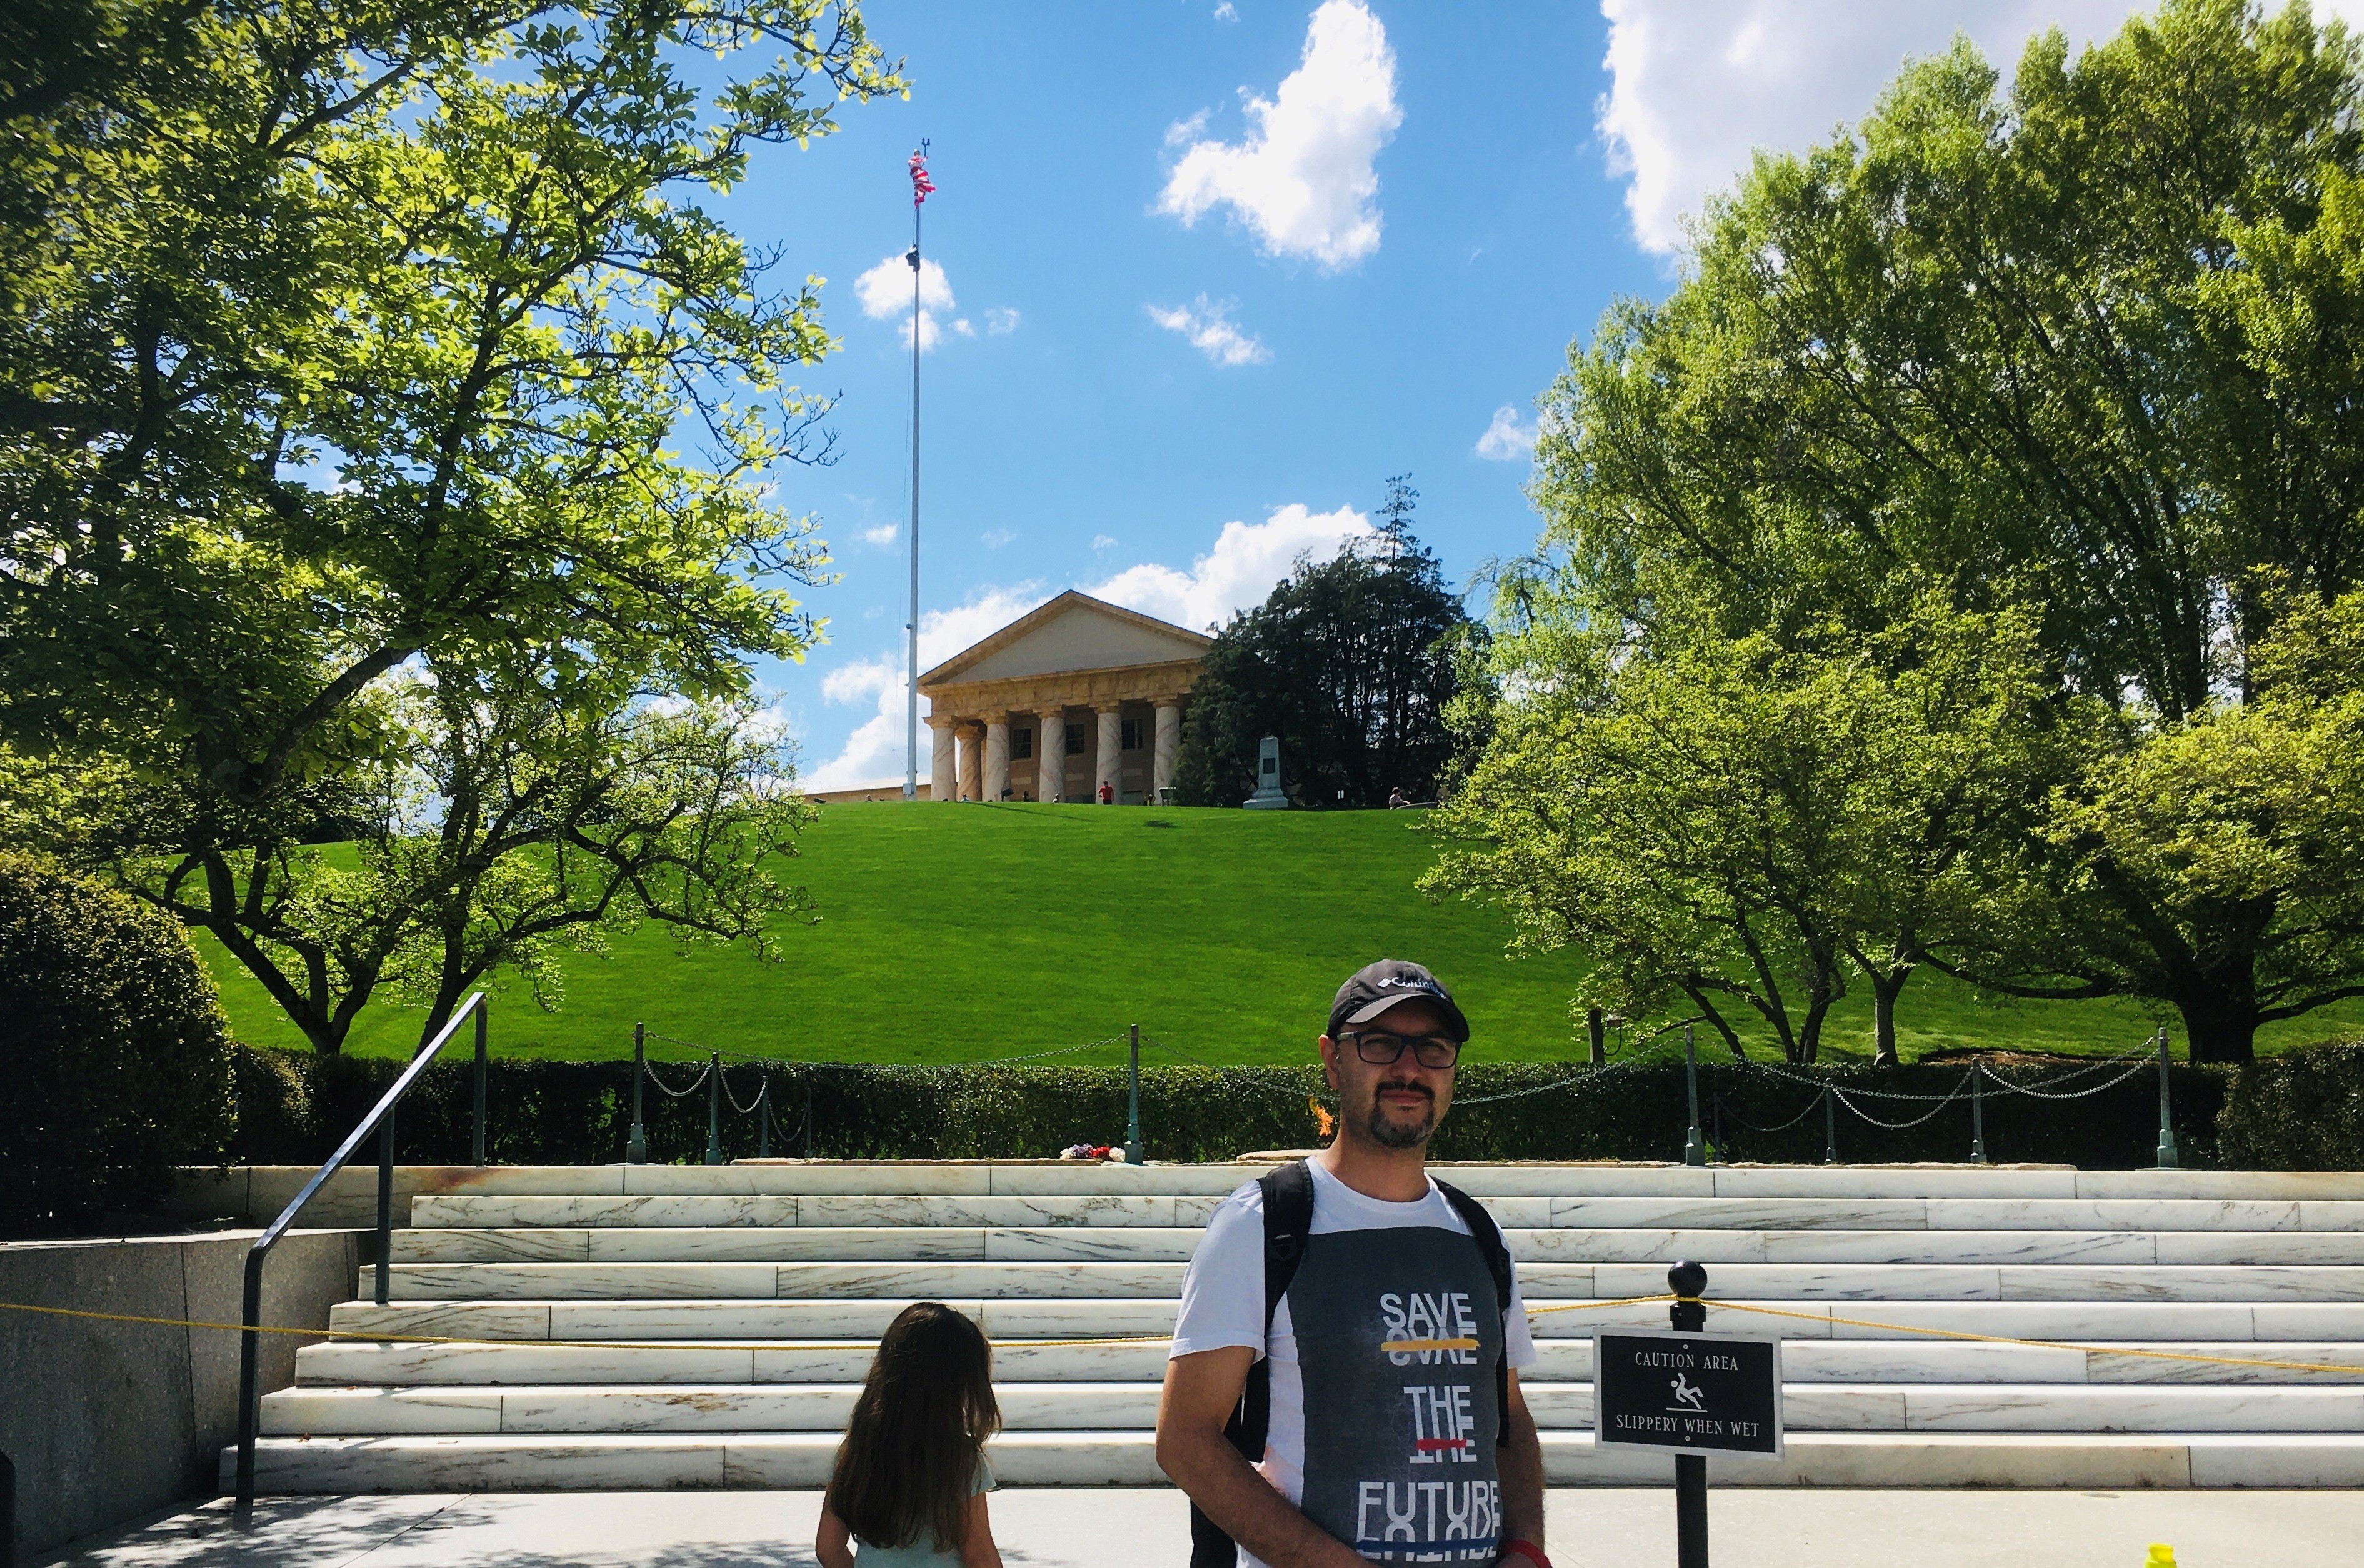 Arlington National Cemetery The John F. Kennedy gravesite